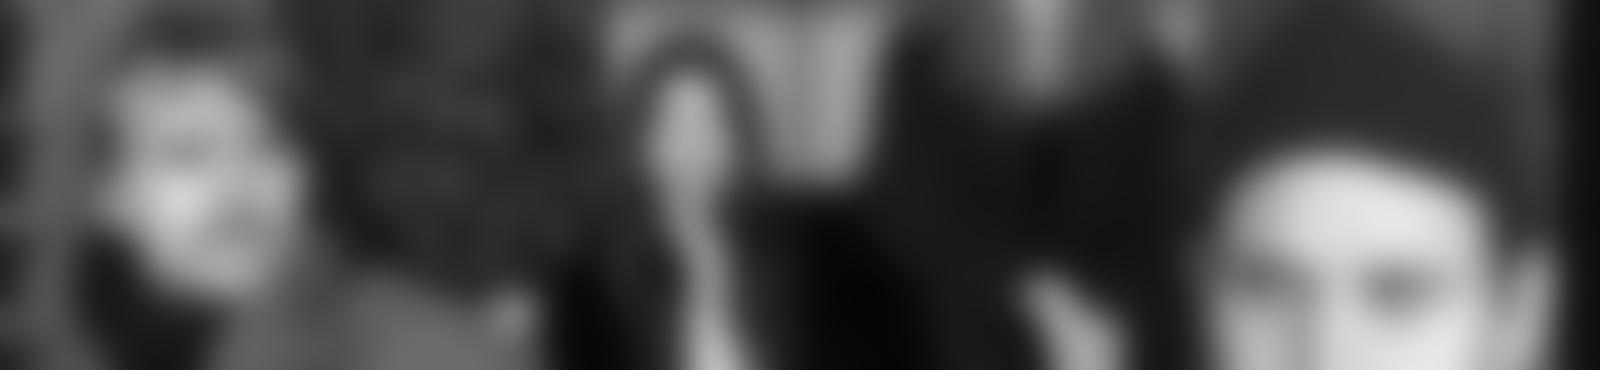 Blurred 9477b38e 5786 41c9 a53b 8ed2f02eadf9